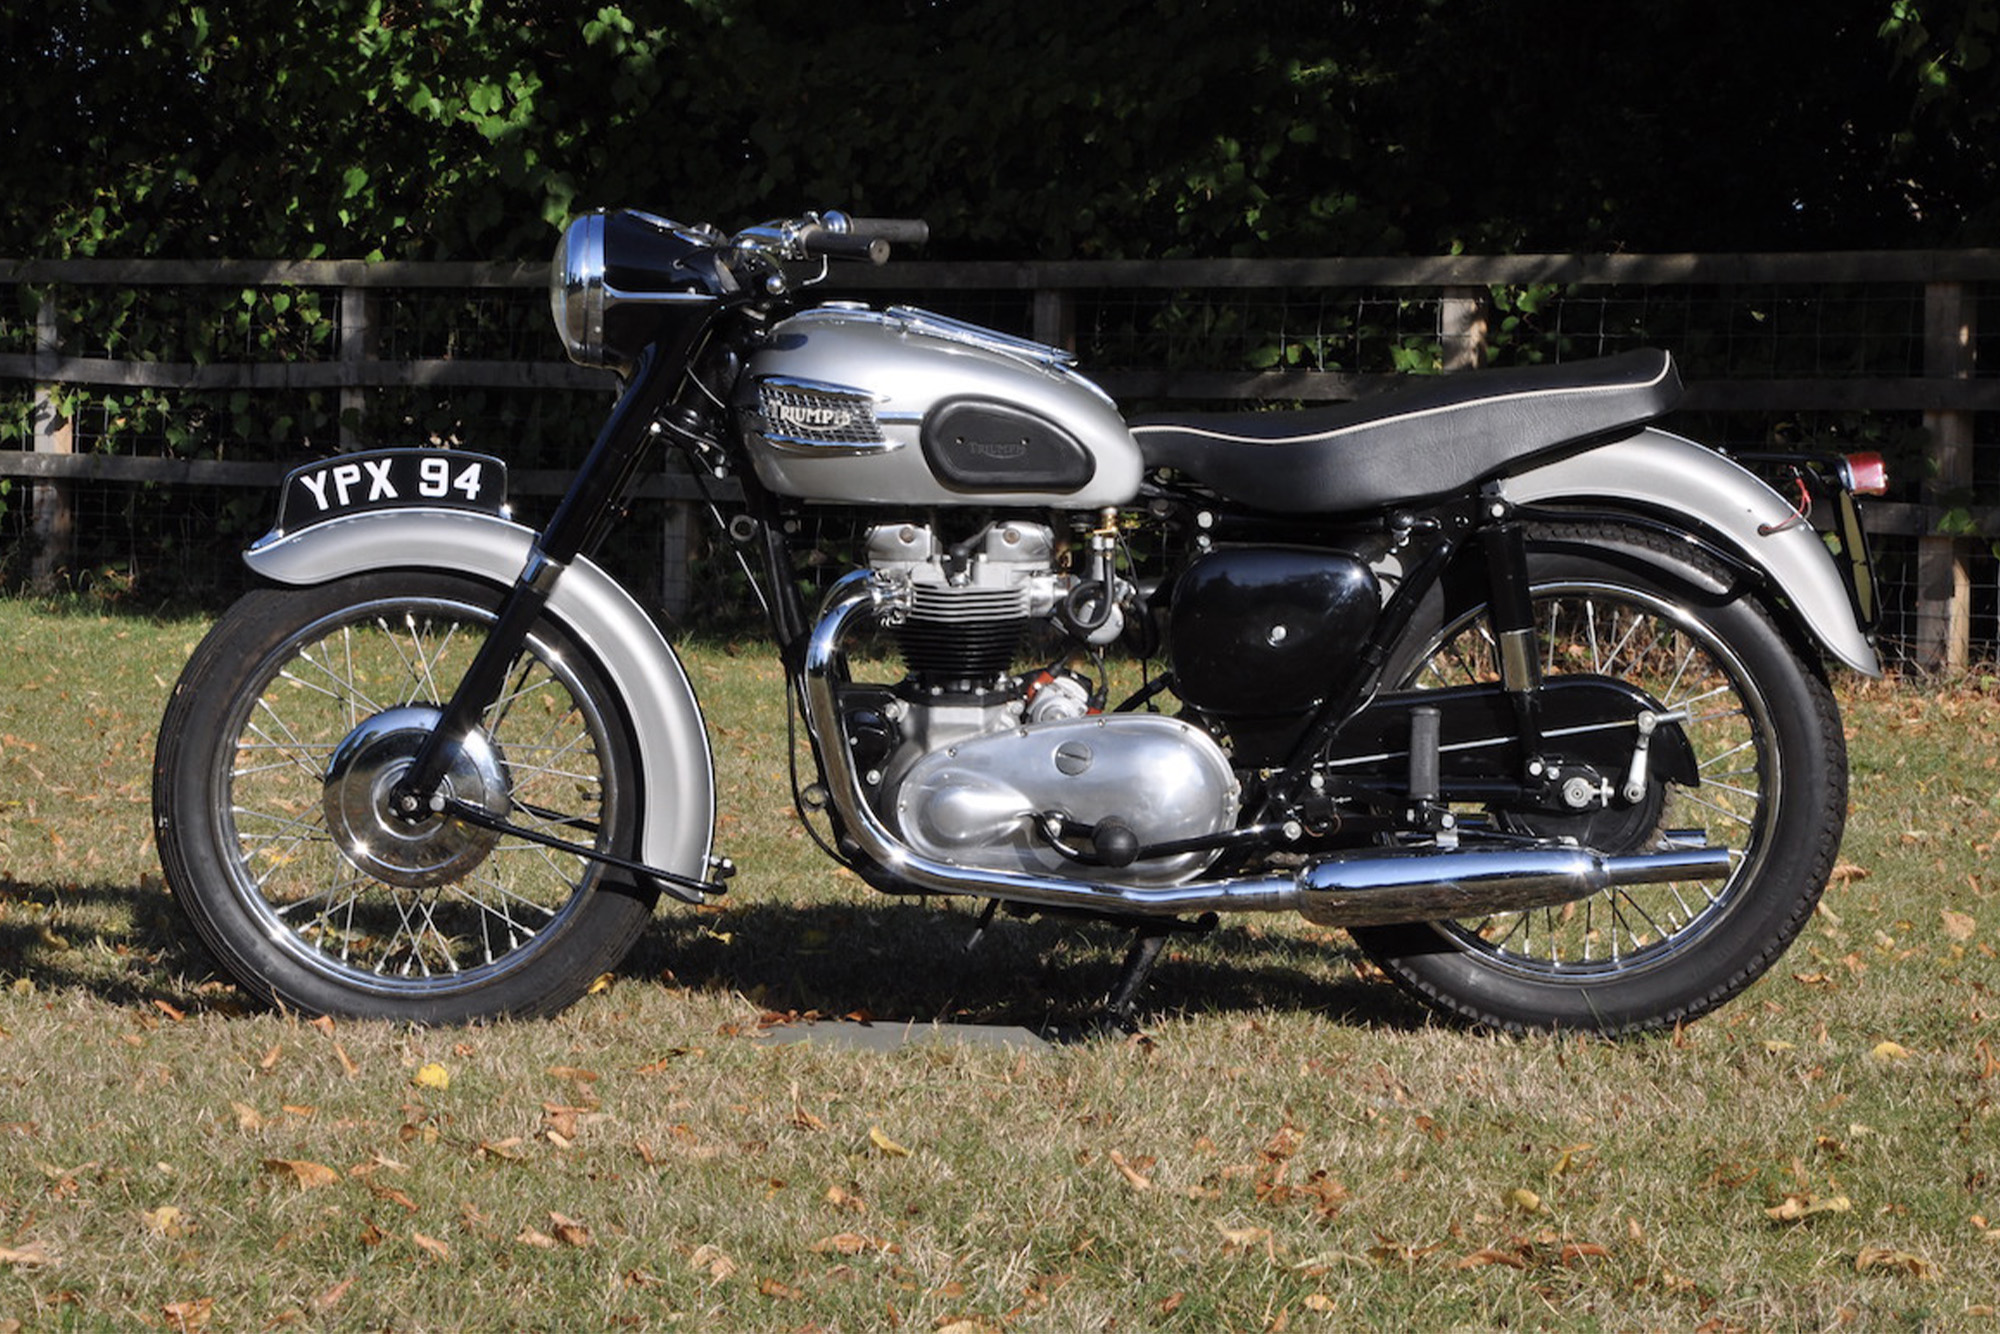 Jenks Triumph bike